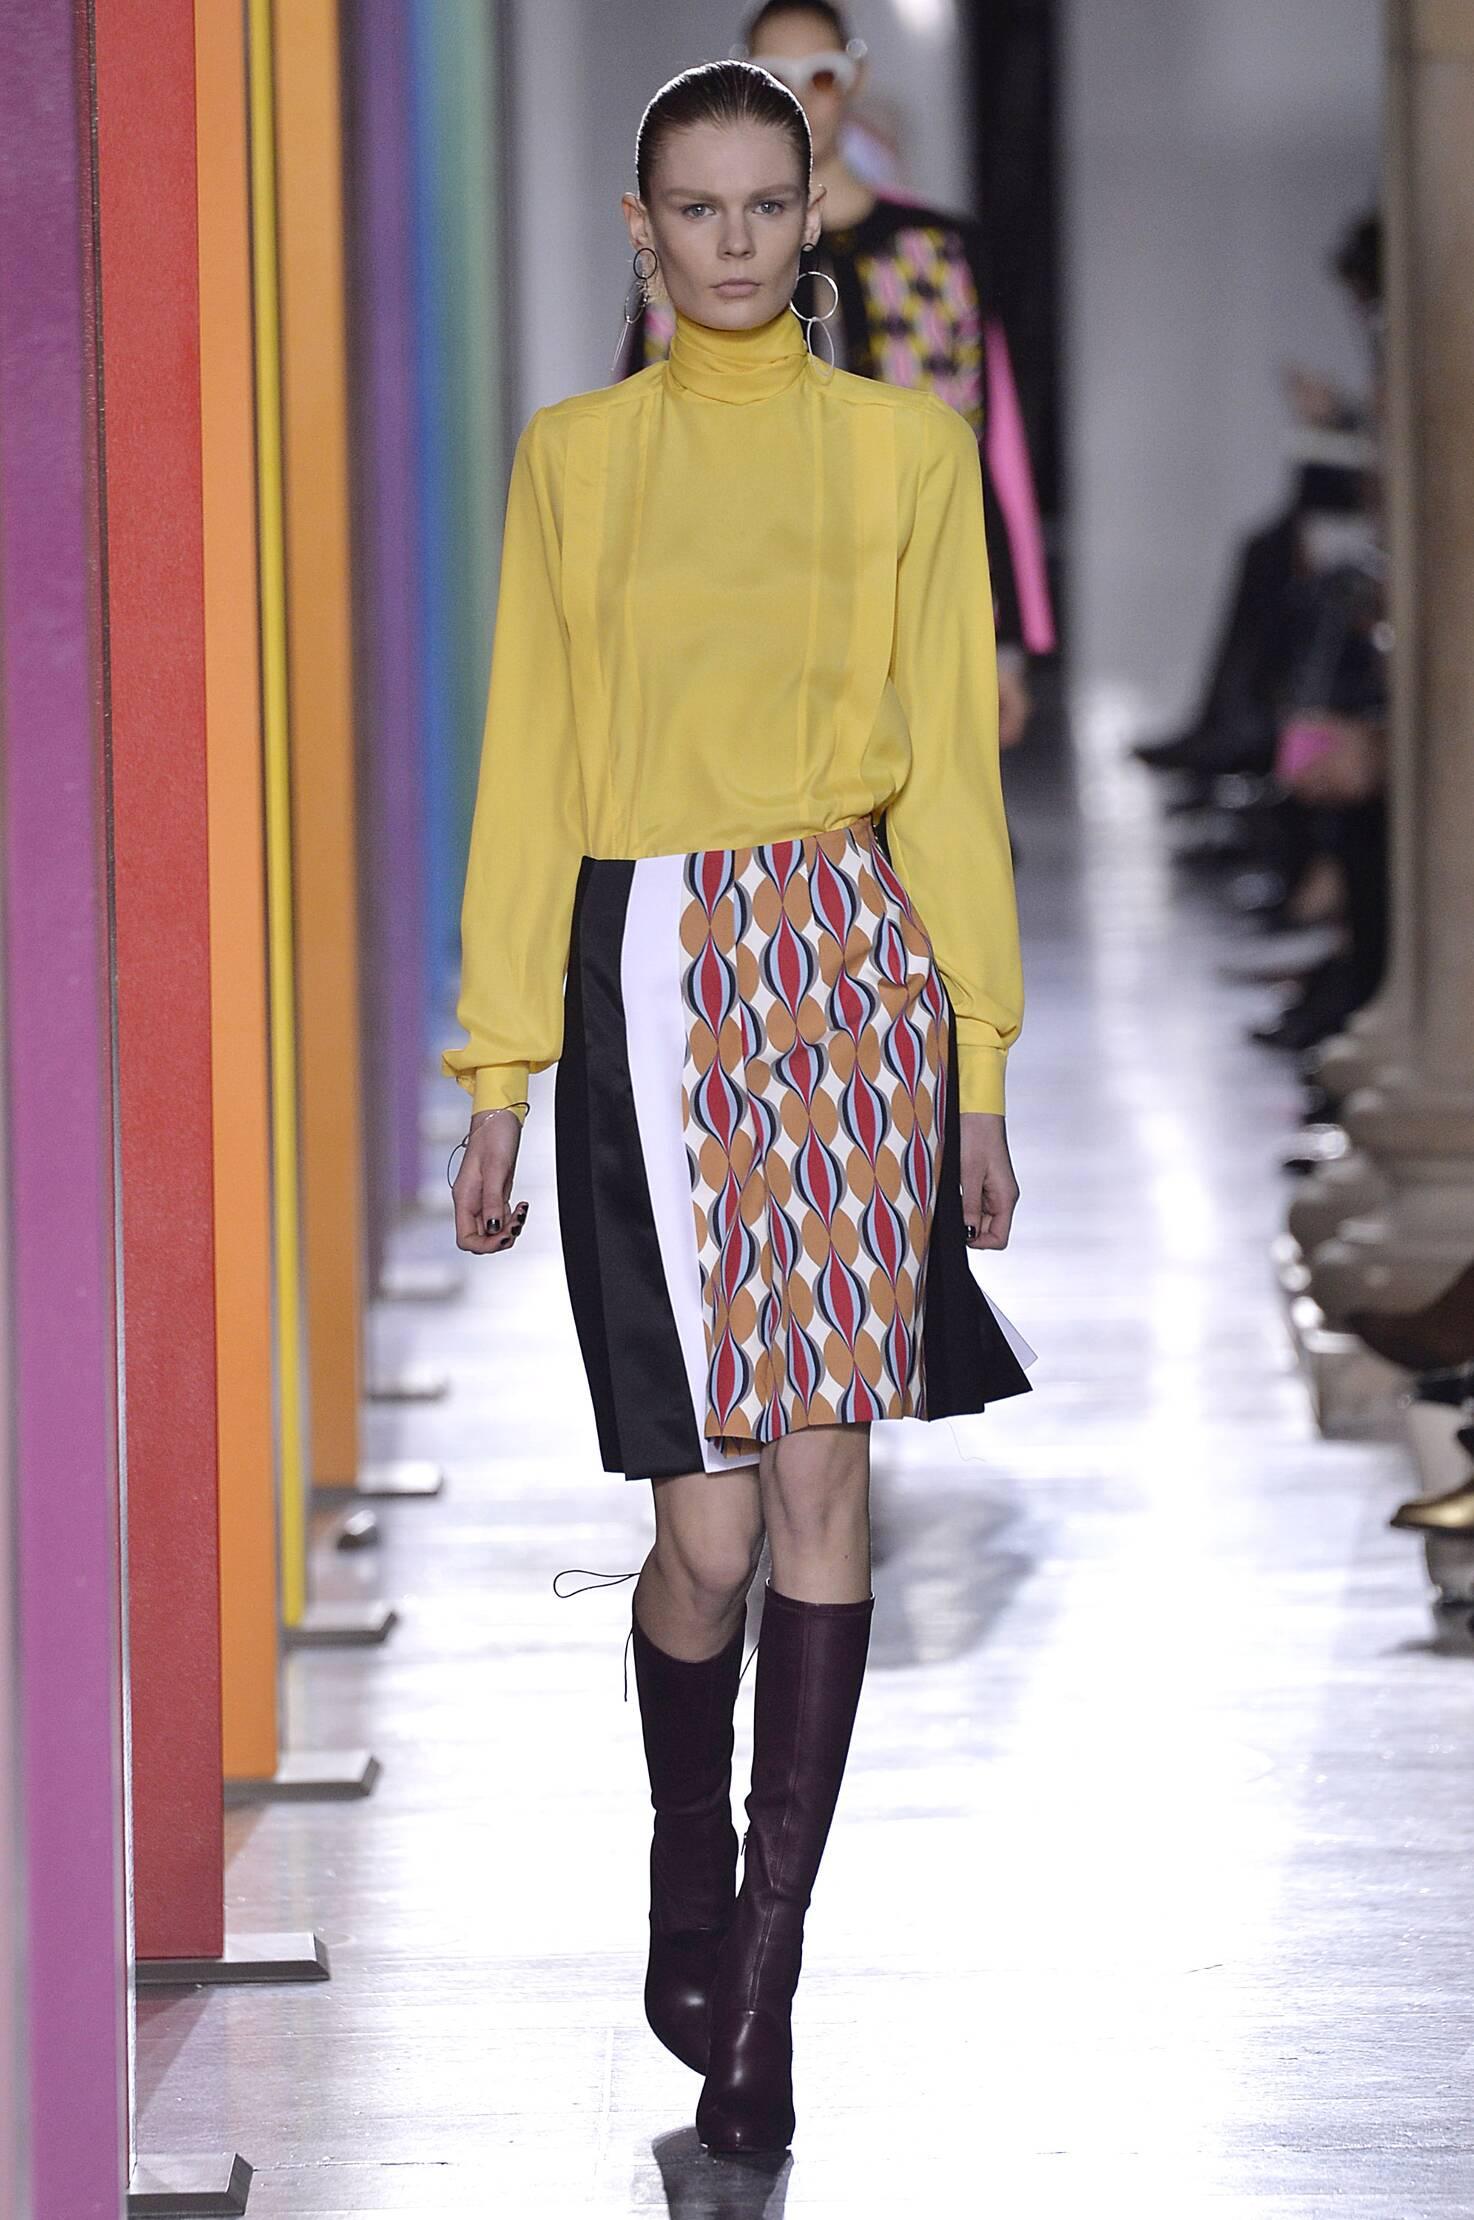 Catwalk Jonathan Saunders Collection Fashion Show Winter 2015